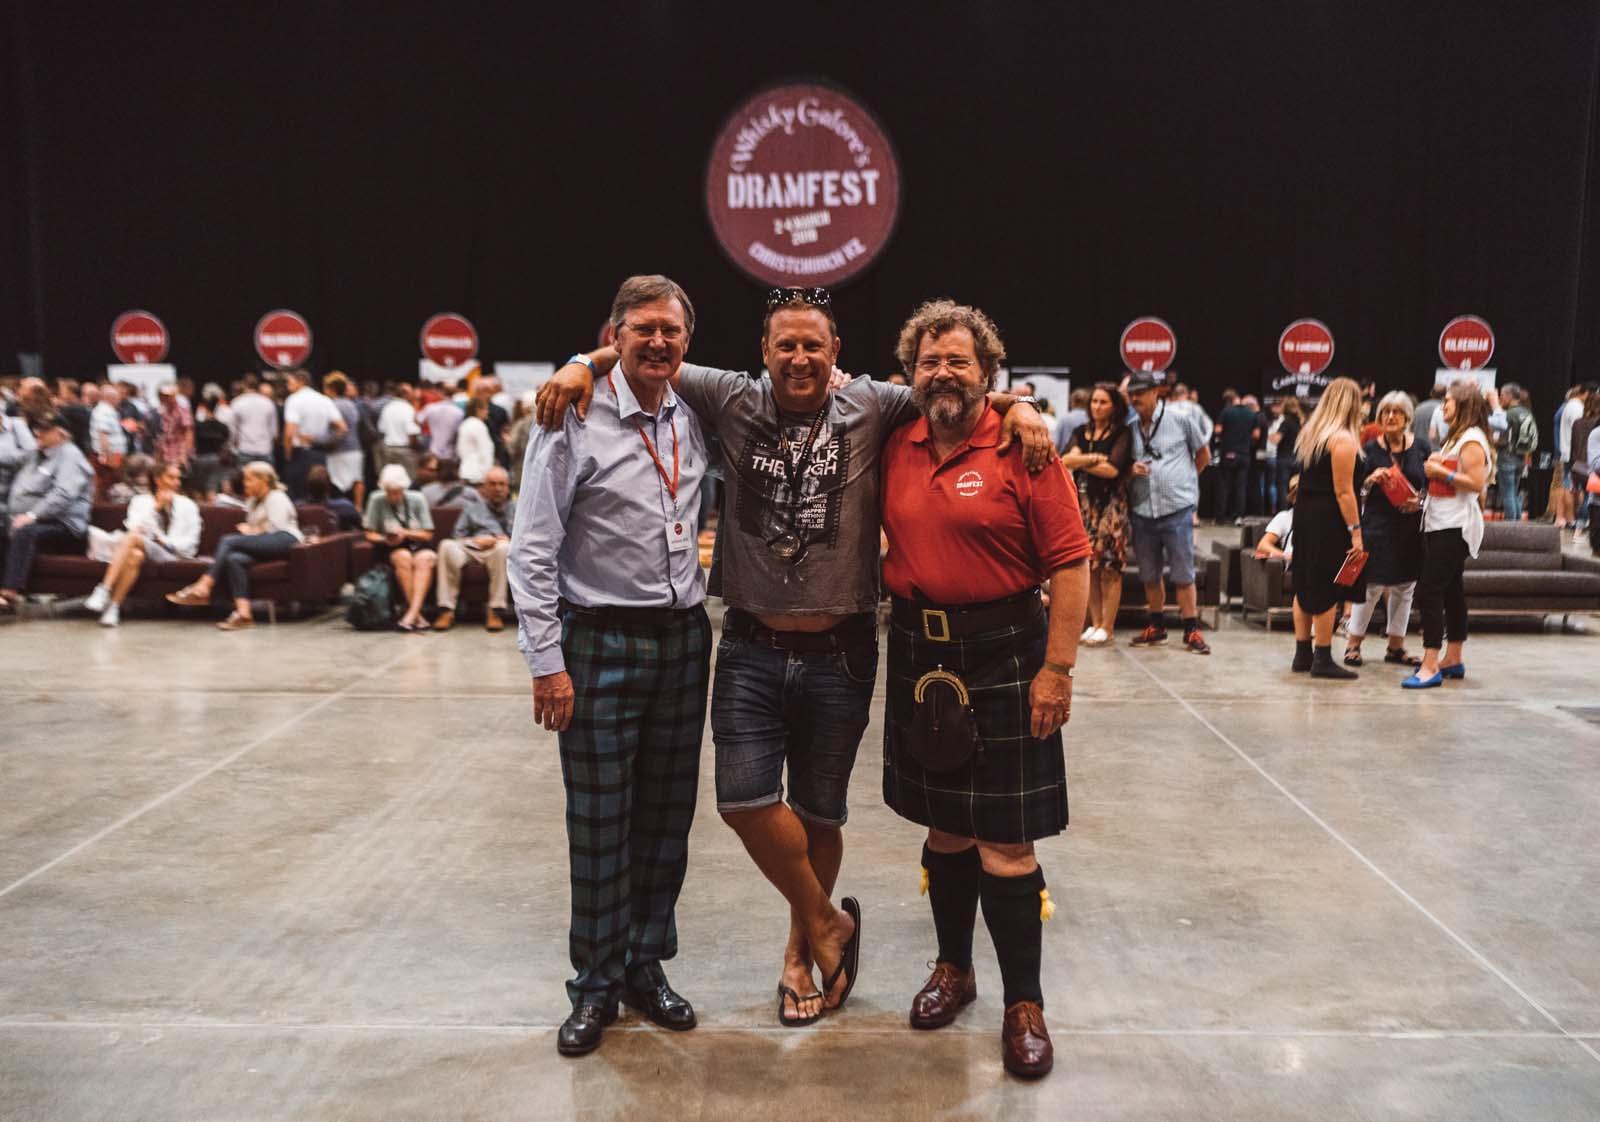 Dramfest 2018 for Whisky Galore-44.jpg